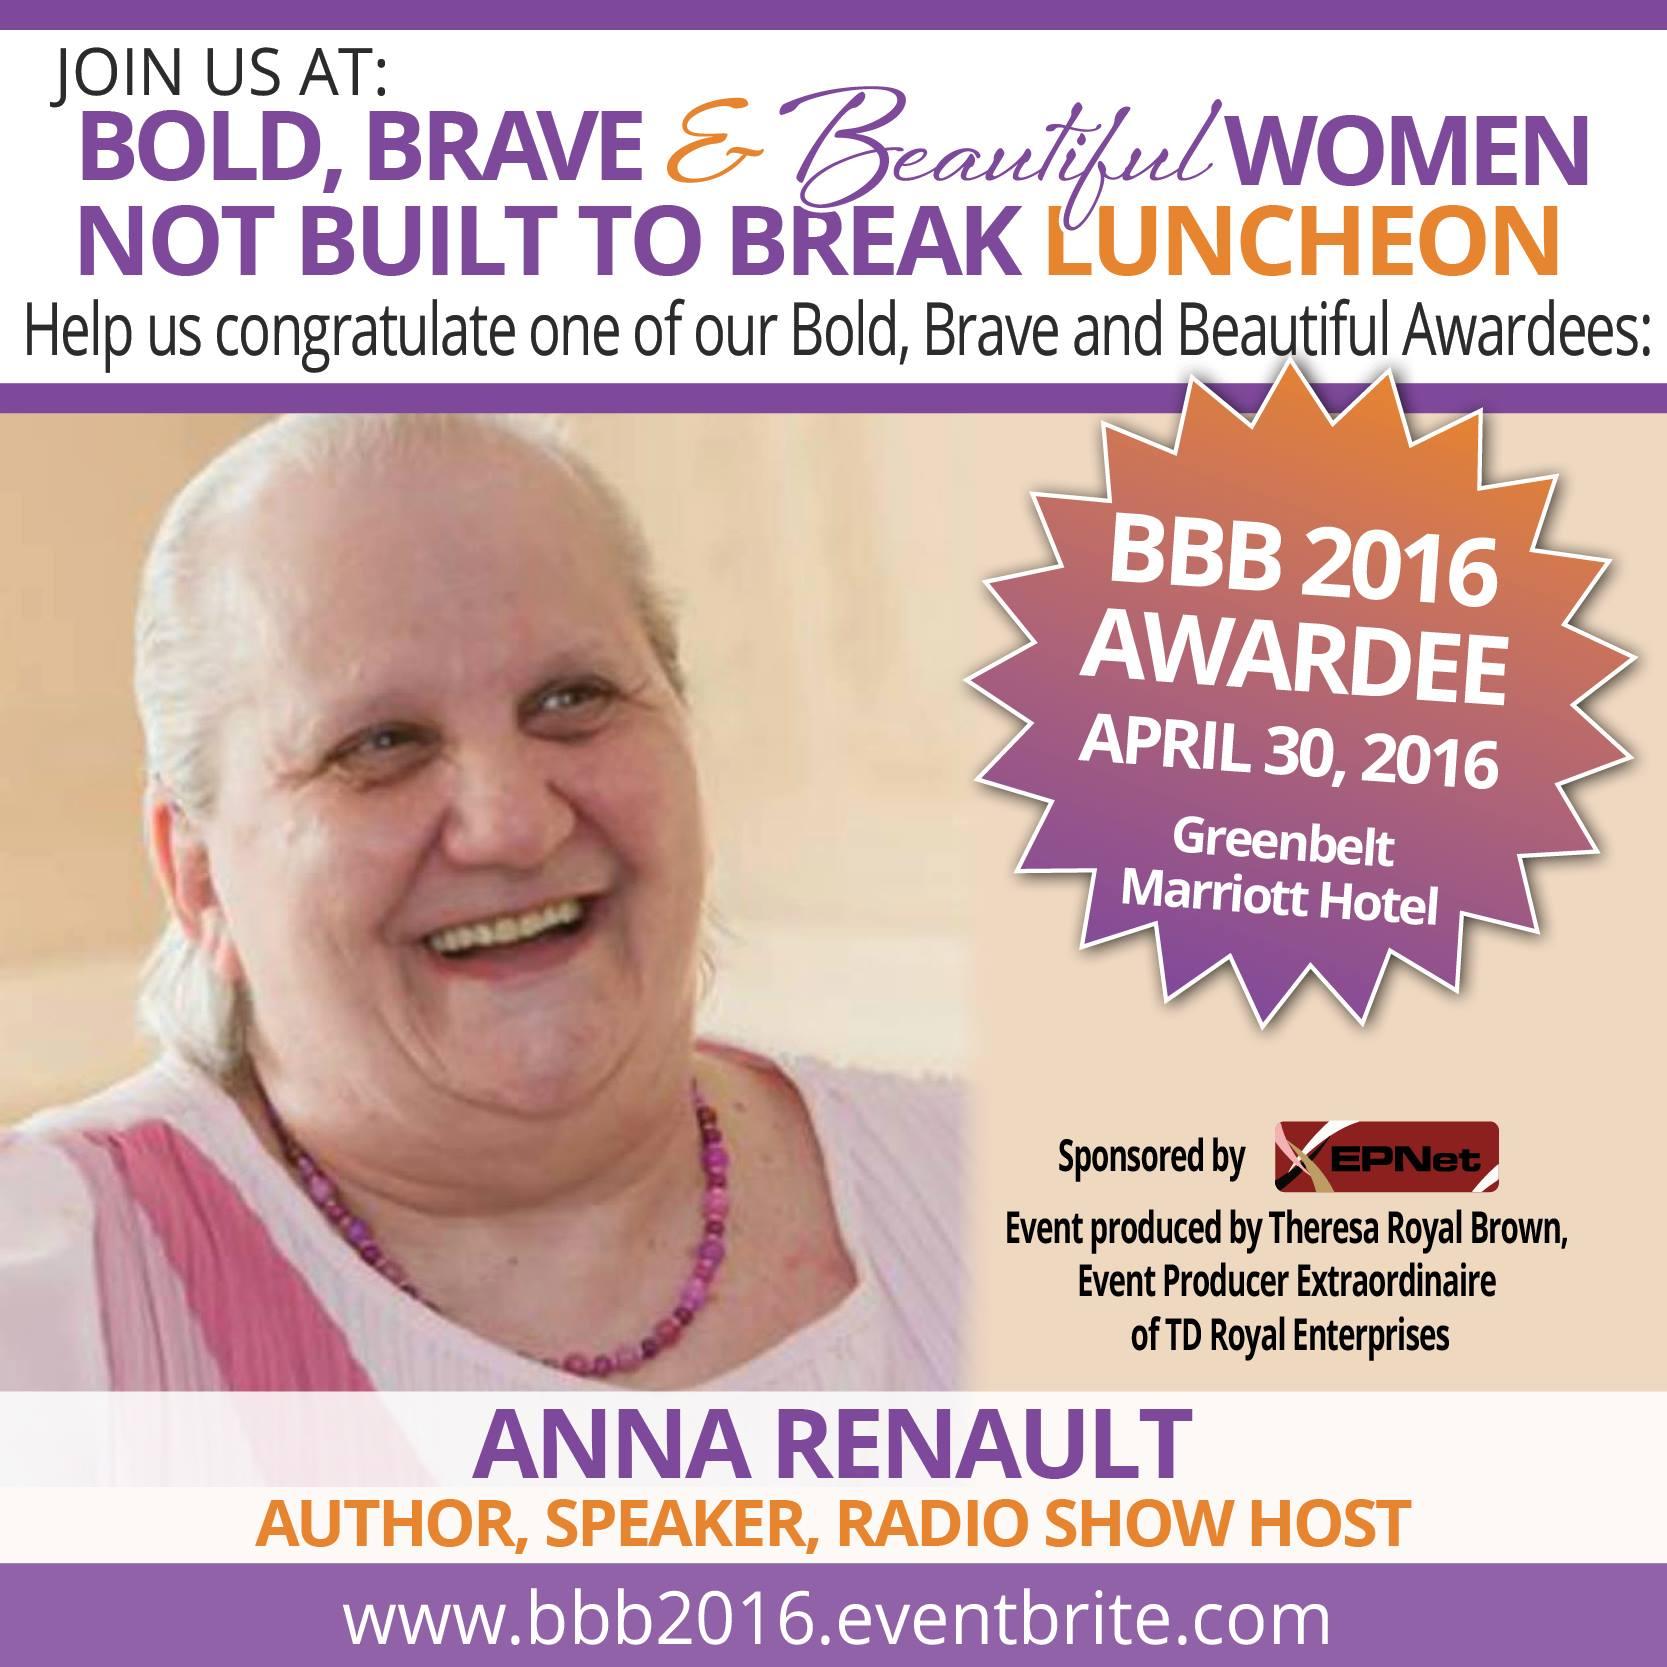 Anna Renault - BBB Awardee